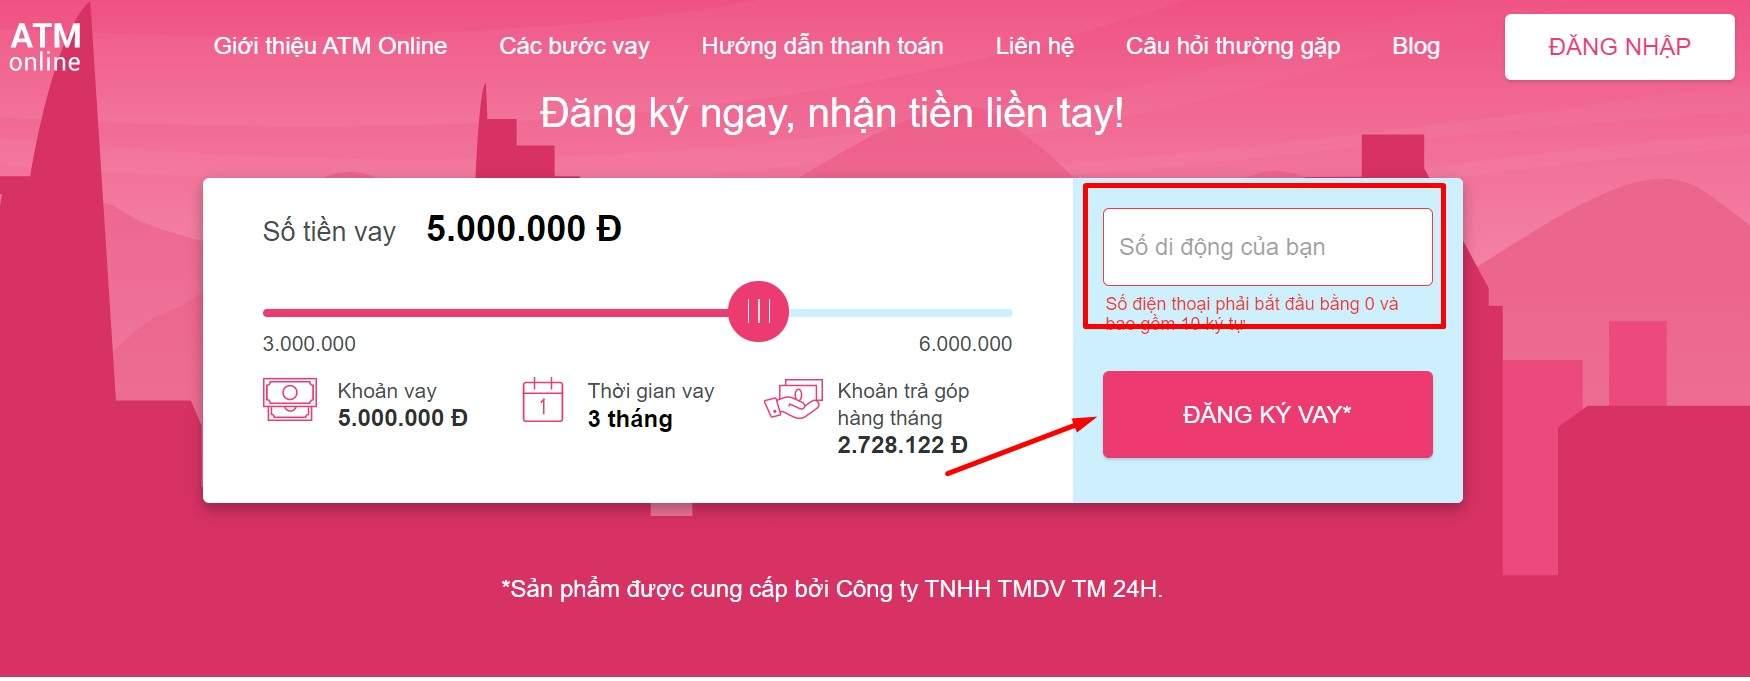 Vay tiền mặt ATM Online